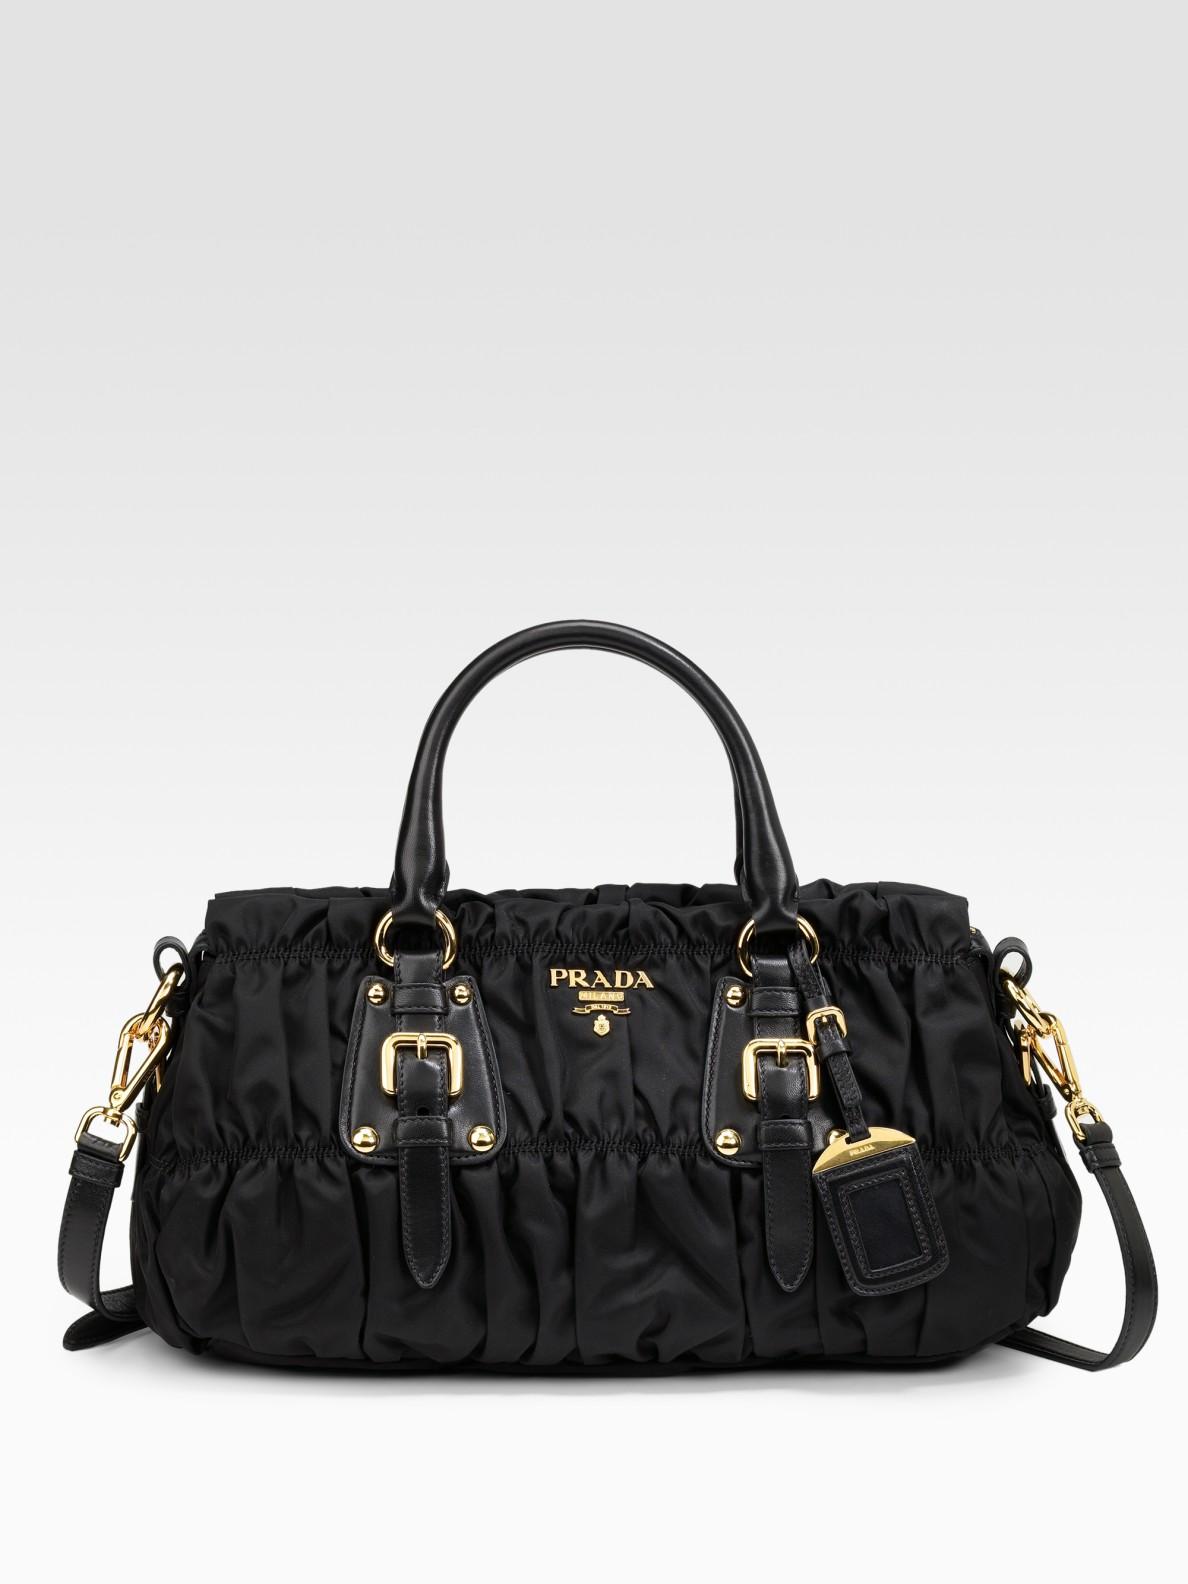 7ff1f89aa12a ... sale lyst prada tessuto gaufre top handle bag in black 4c7ad a7232